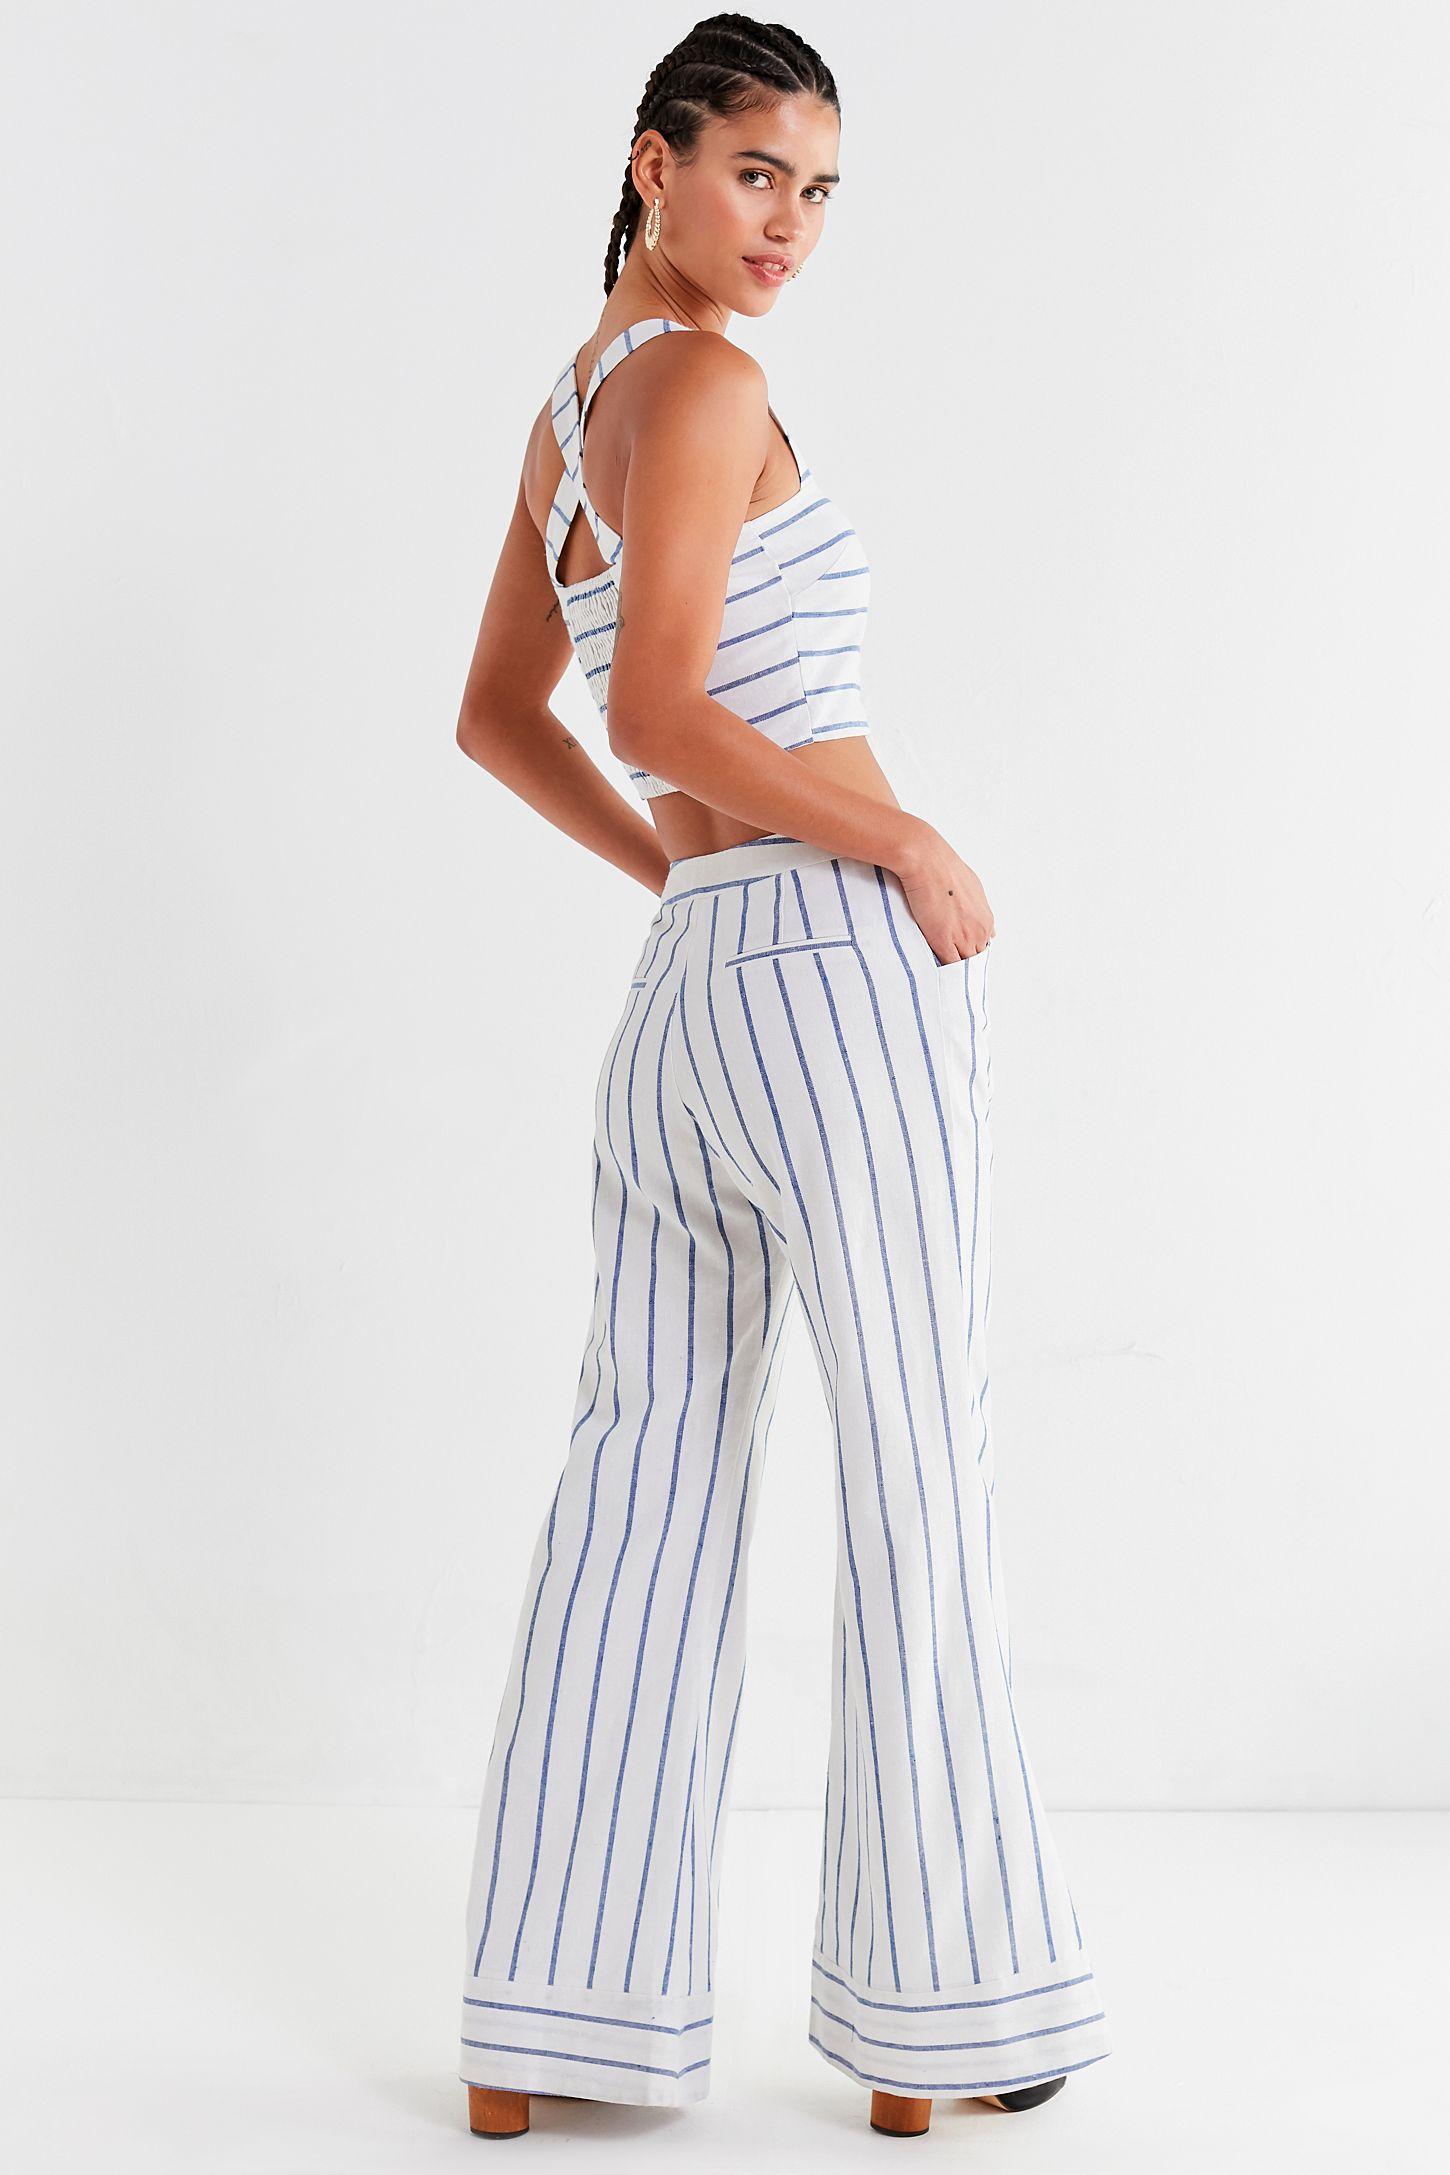 88f8c0e15e8e55 Lucca Couture Isla Striped Flare Pant